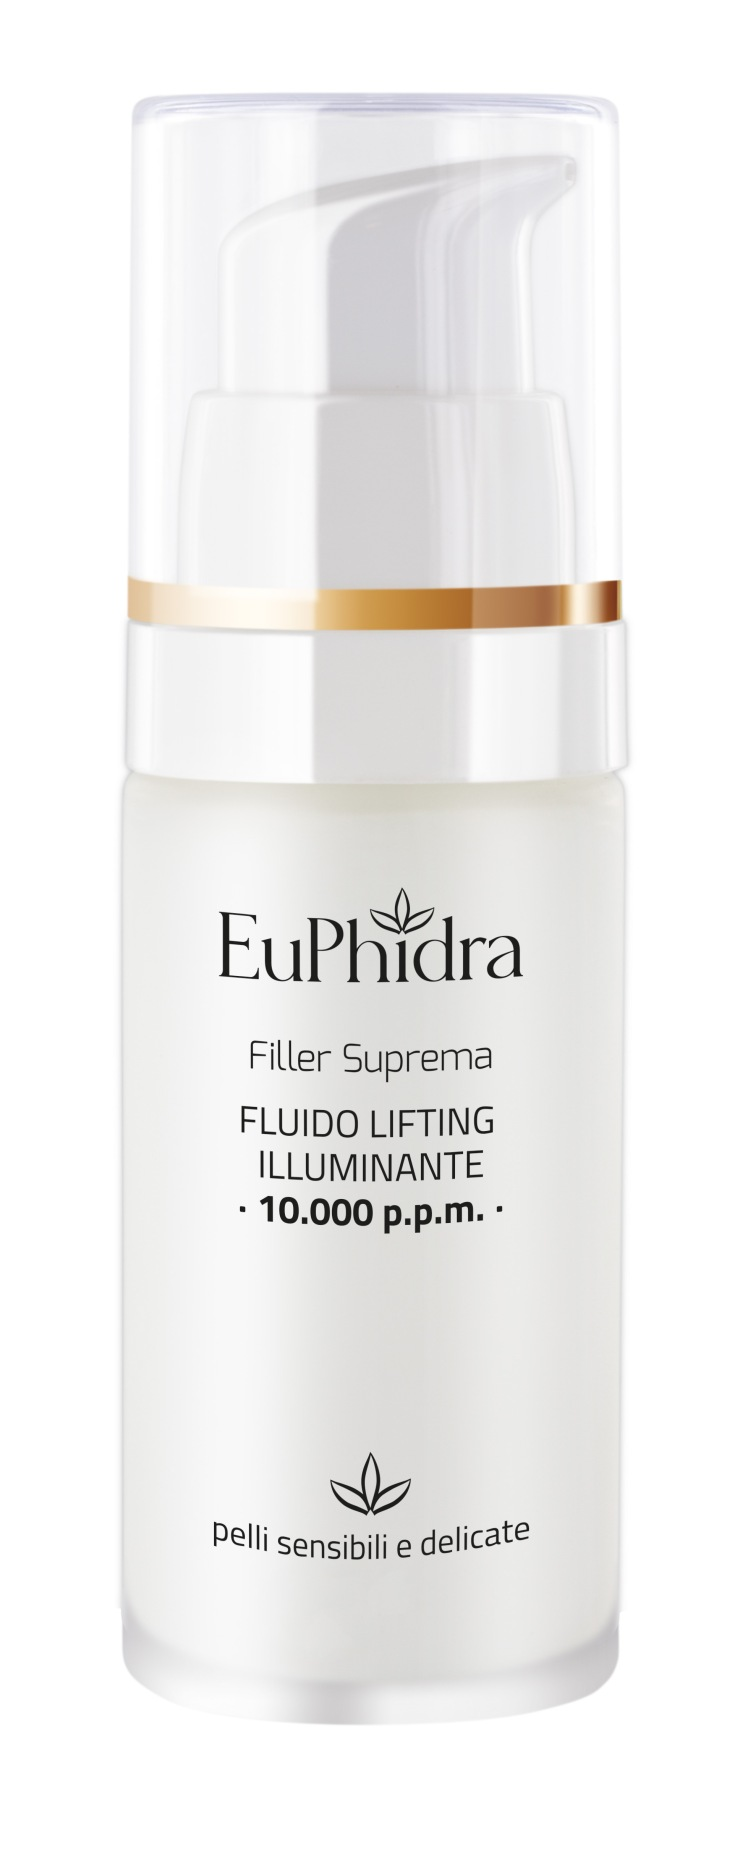 fillersuprema_fluido_lifting-illuminante